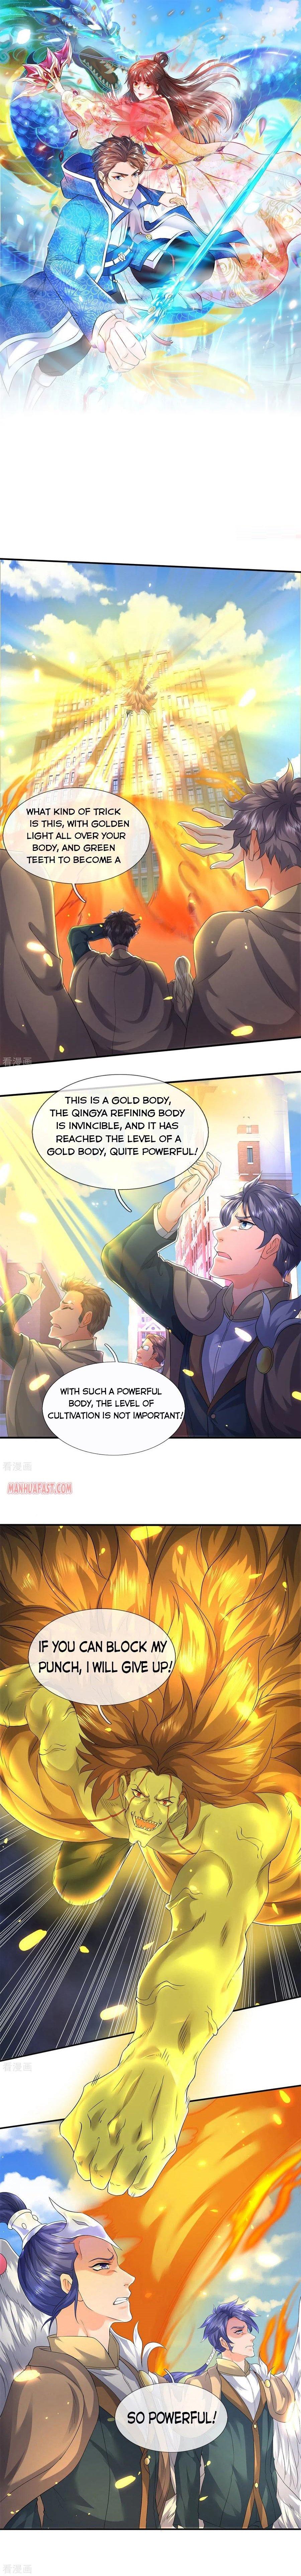 https://manga.mangadogs.com/comics/pic4/39/32615/2916903/1e8105077e7cdeabfcf1cd16db6c83a2.jpg Page 1